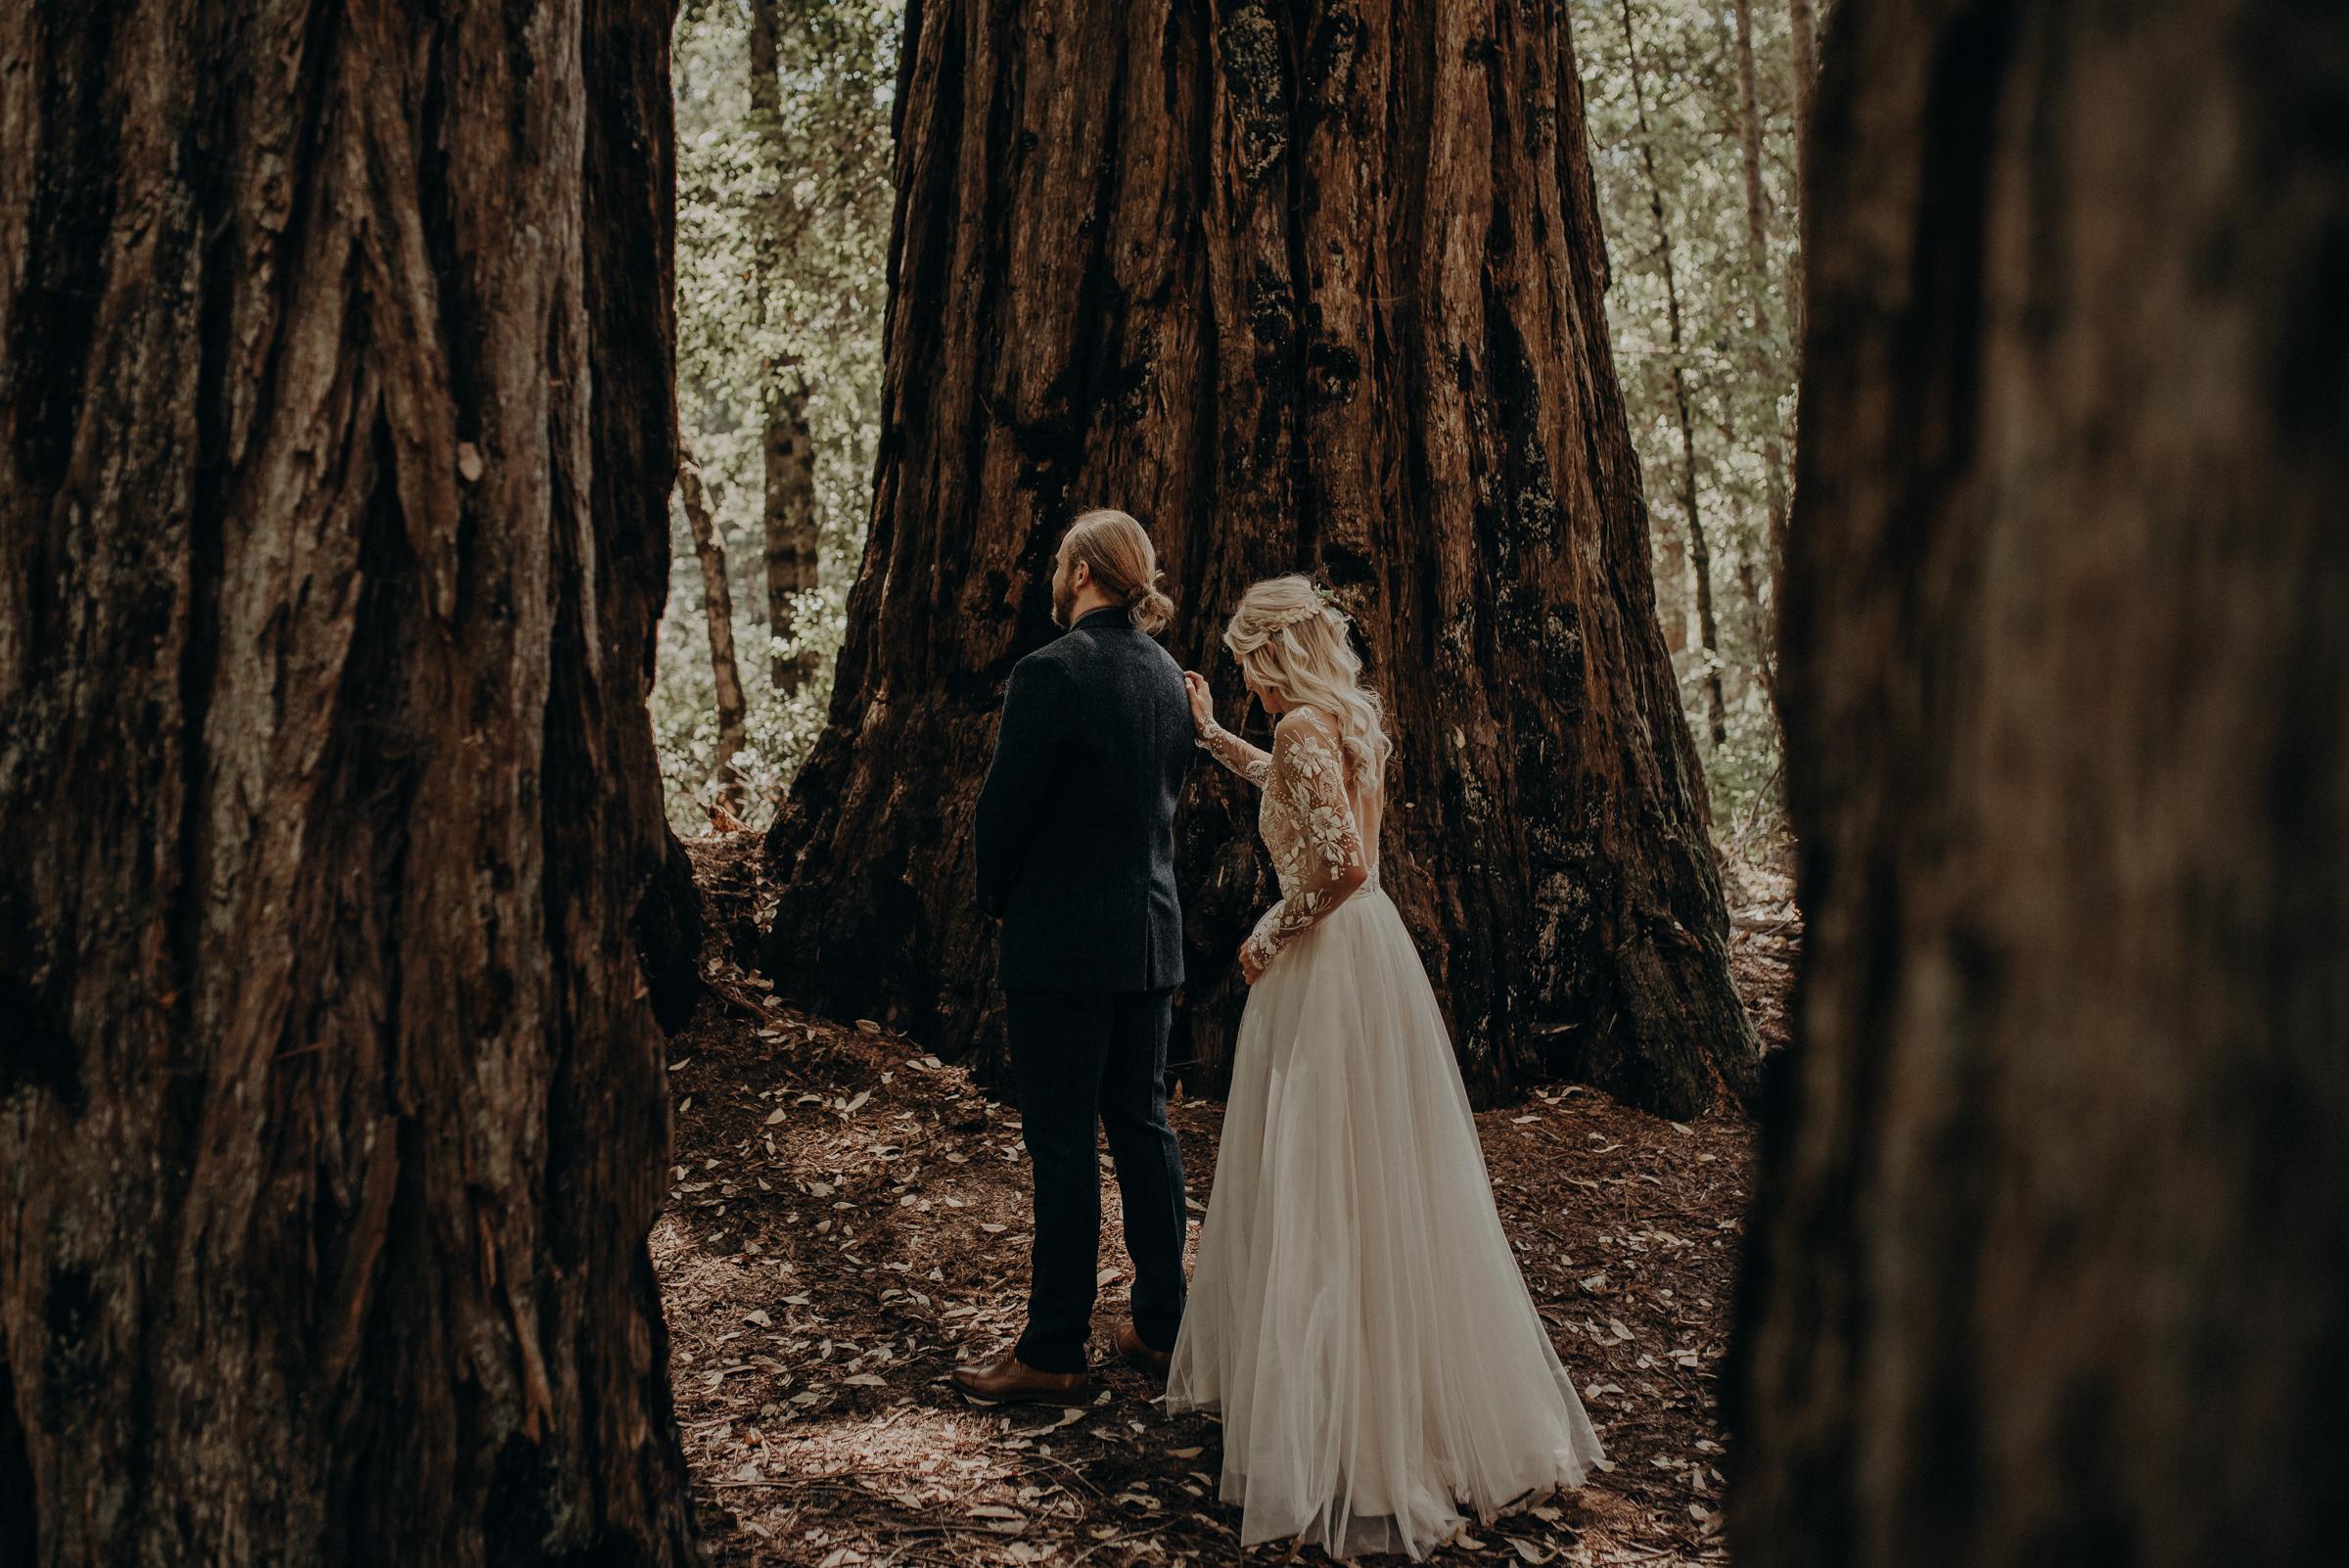 IsaiahAndTaylor.com - California Destination Elopement, Lake Leonard Reserve Wedding, Ukiah-051.jpg